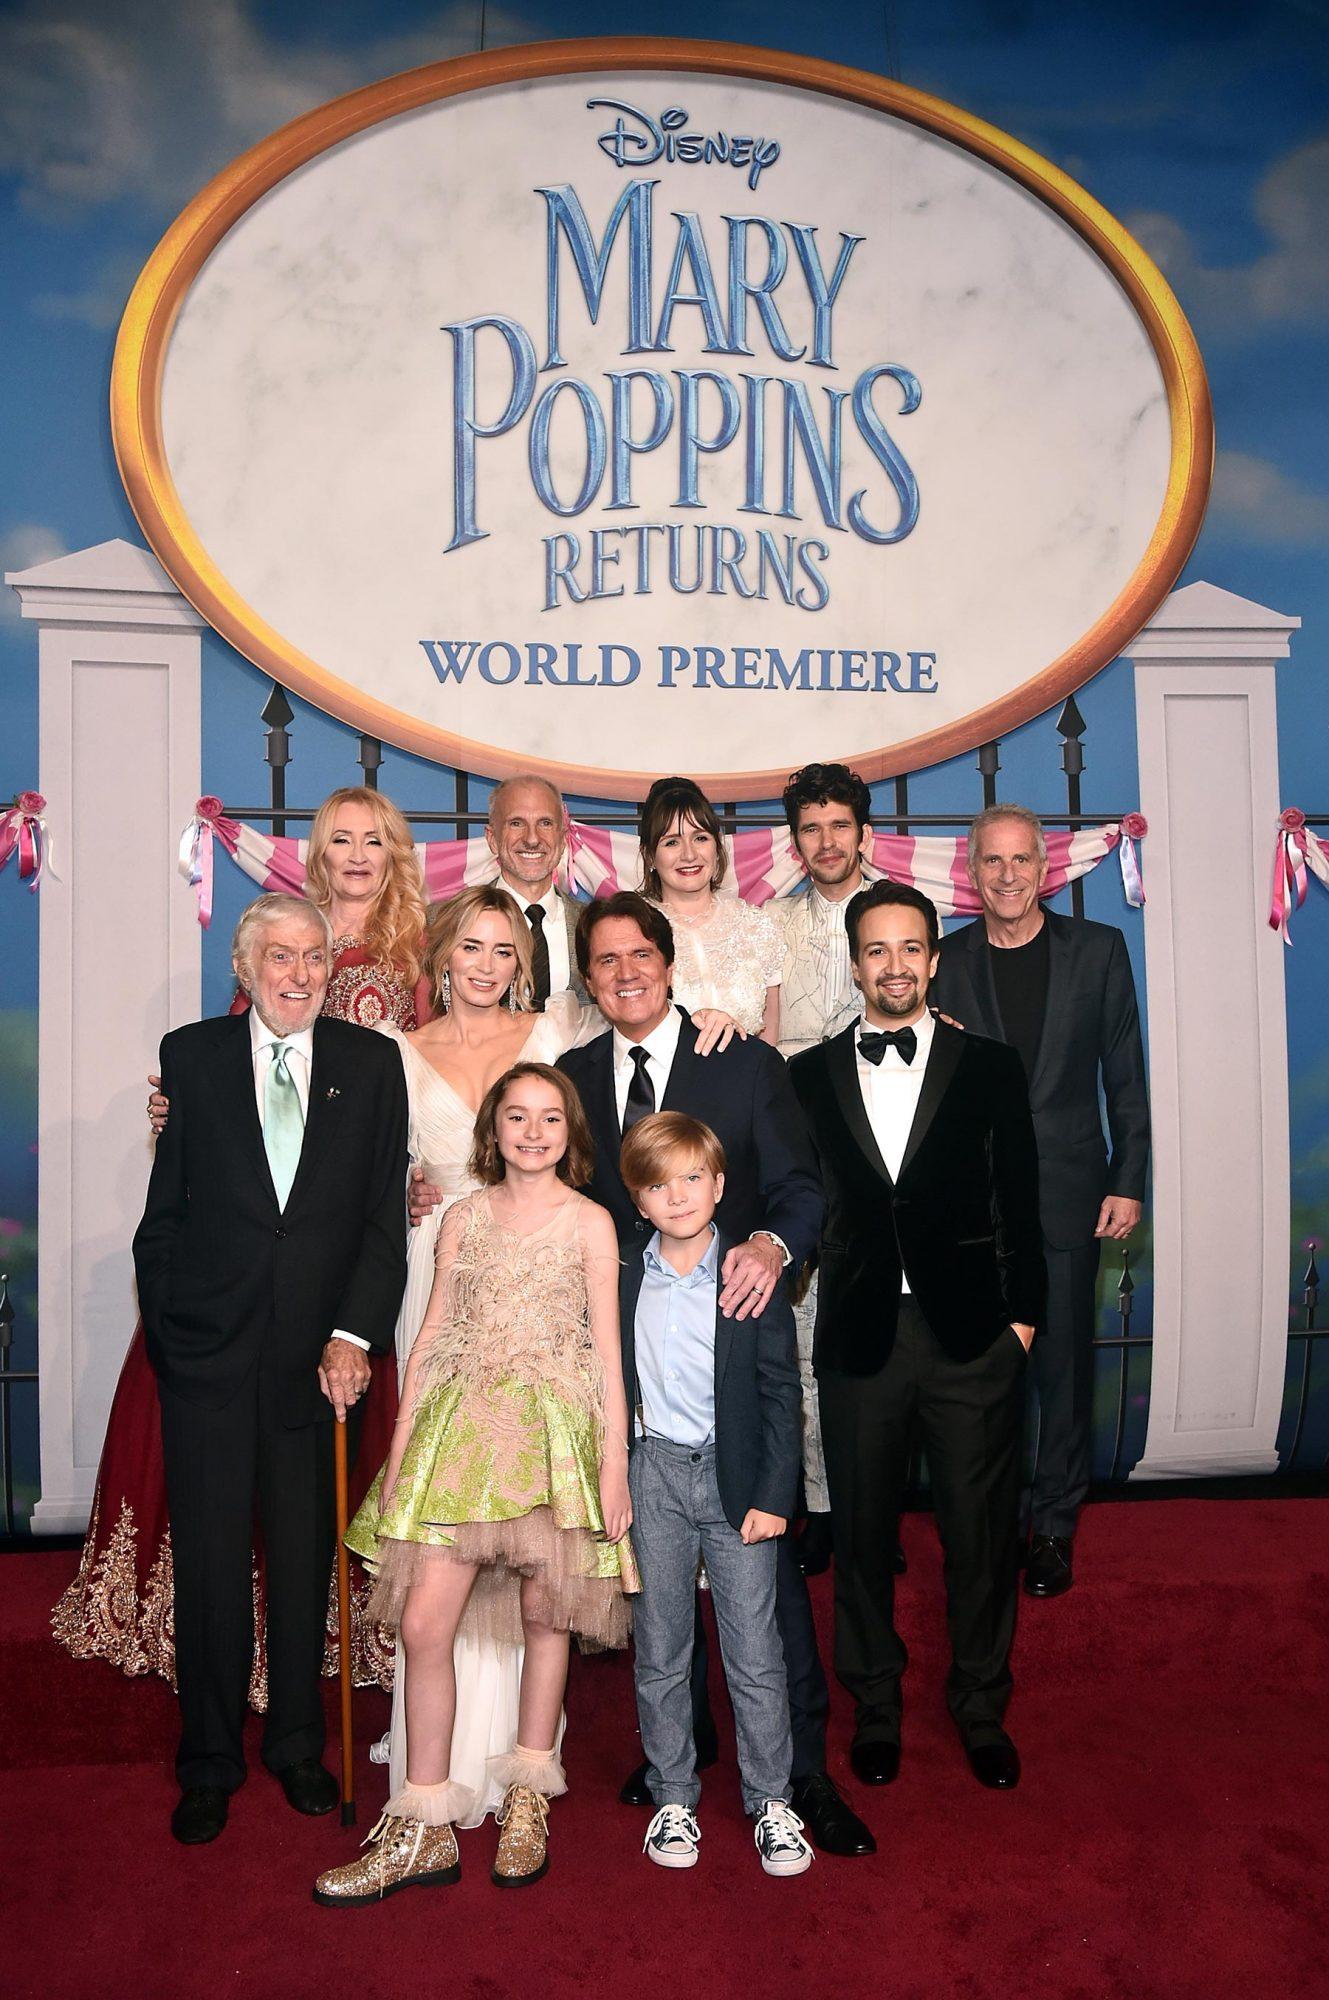 Disney's 'Mary Poppins Returns' World Premiere